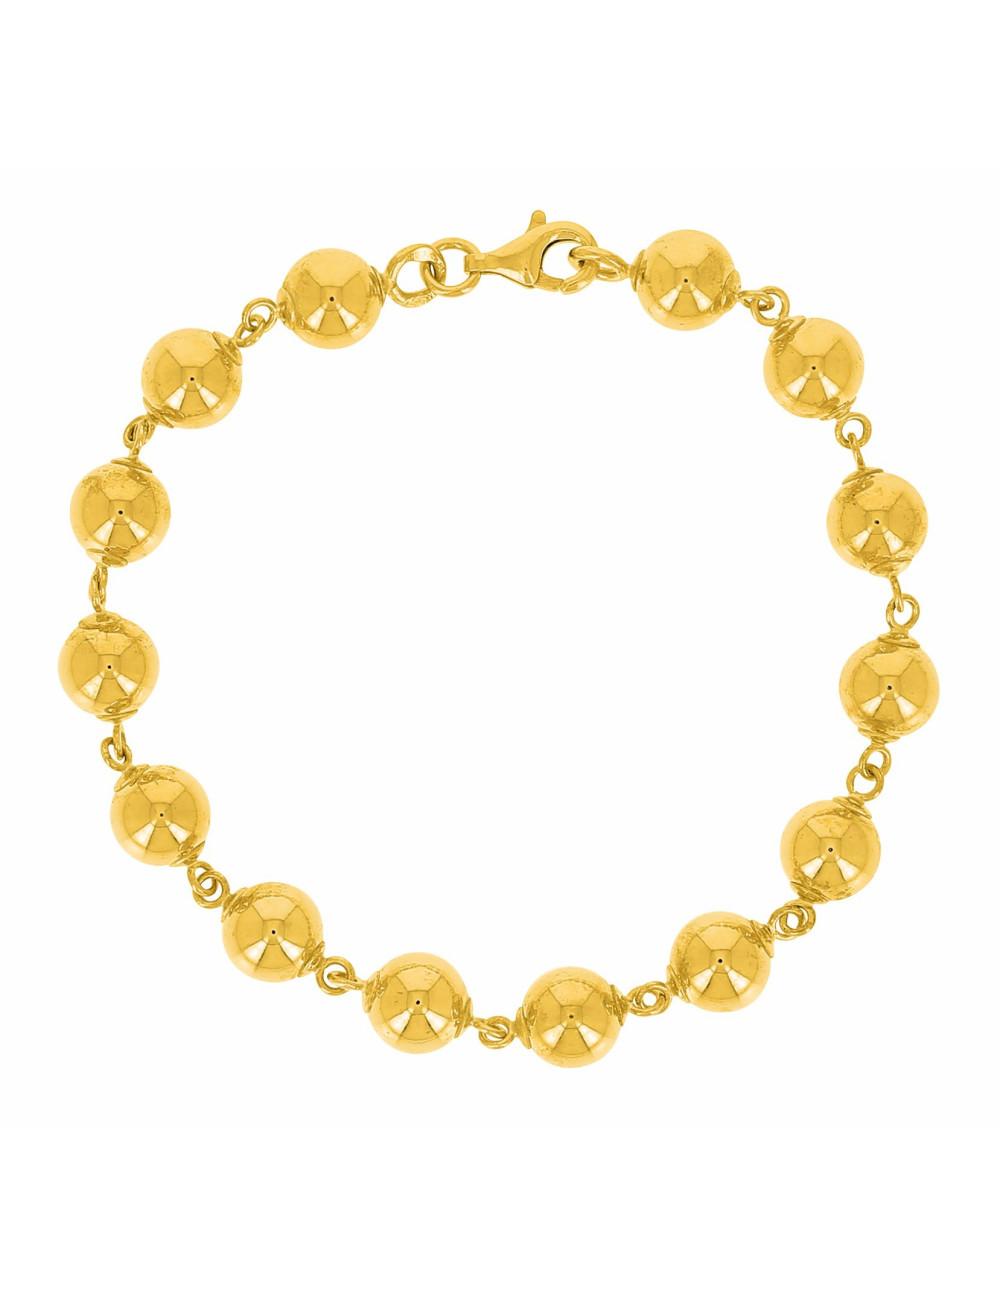 Bracelet Boule Or Jaune 750/1000 bijoux